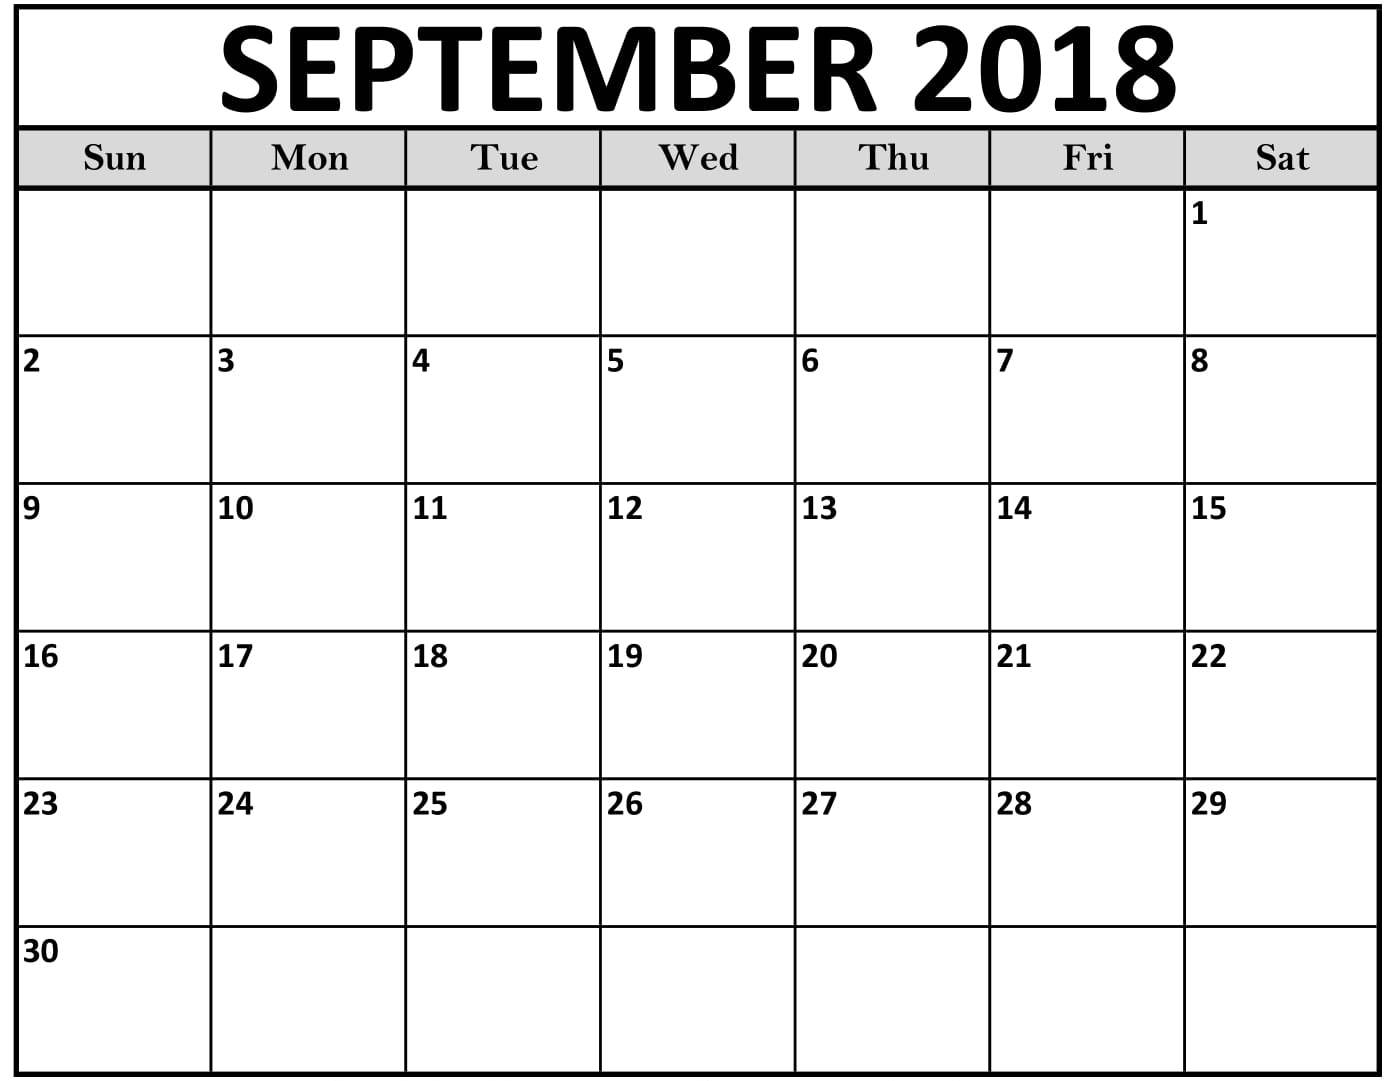 Blank Calendar September 2018 Template Free Printable Calendar regarding Blank Calendars Printable September